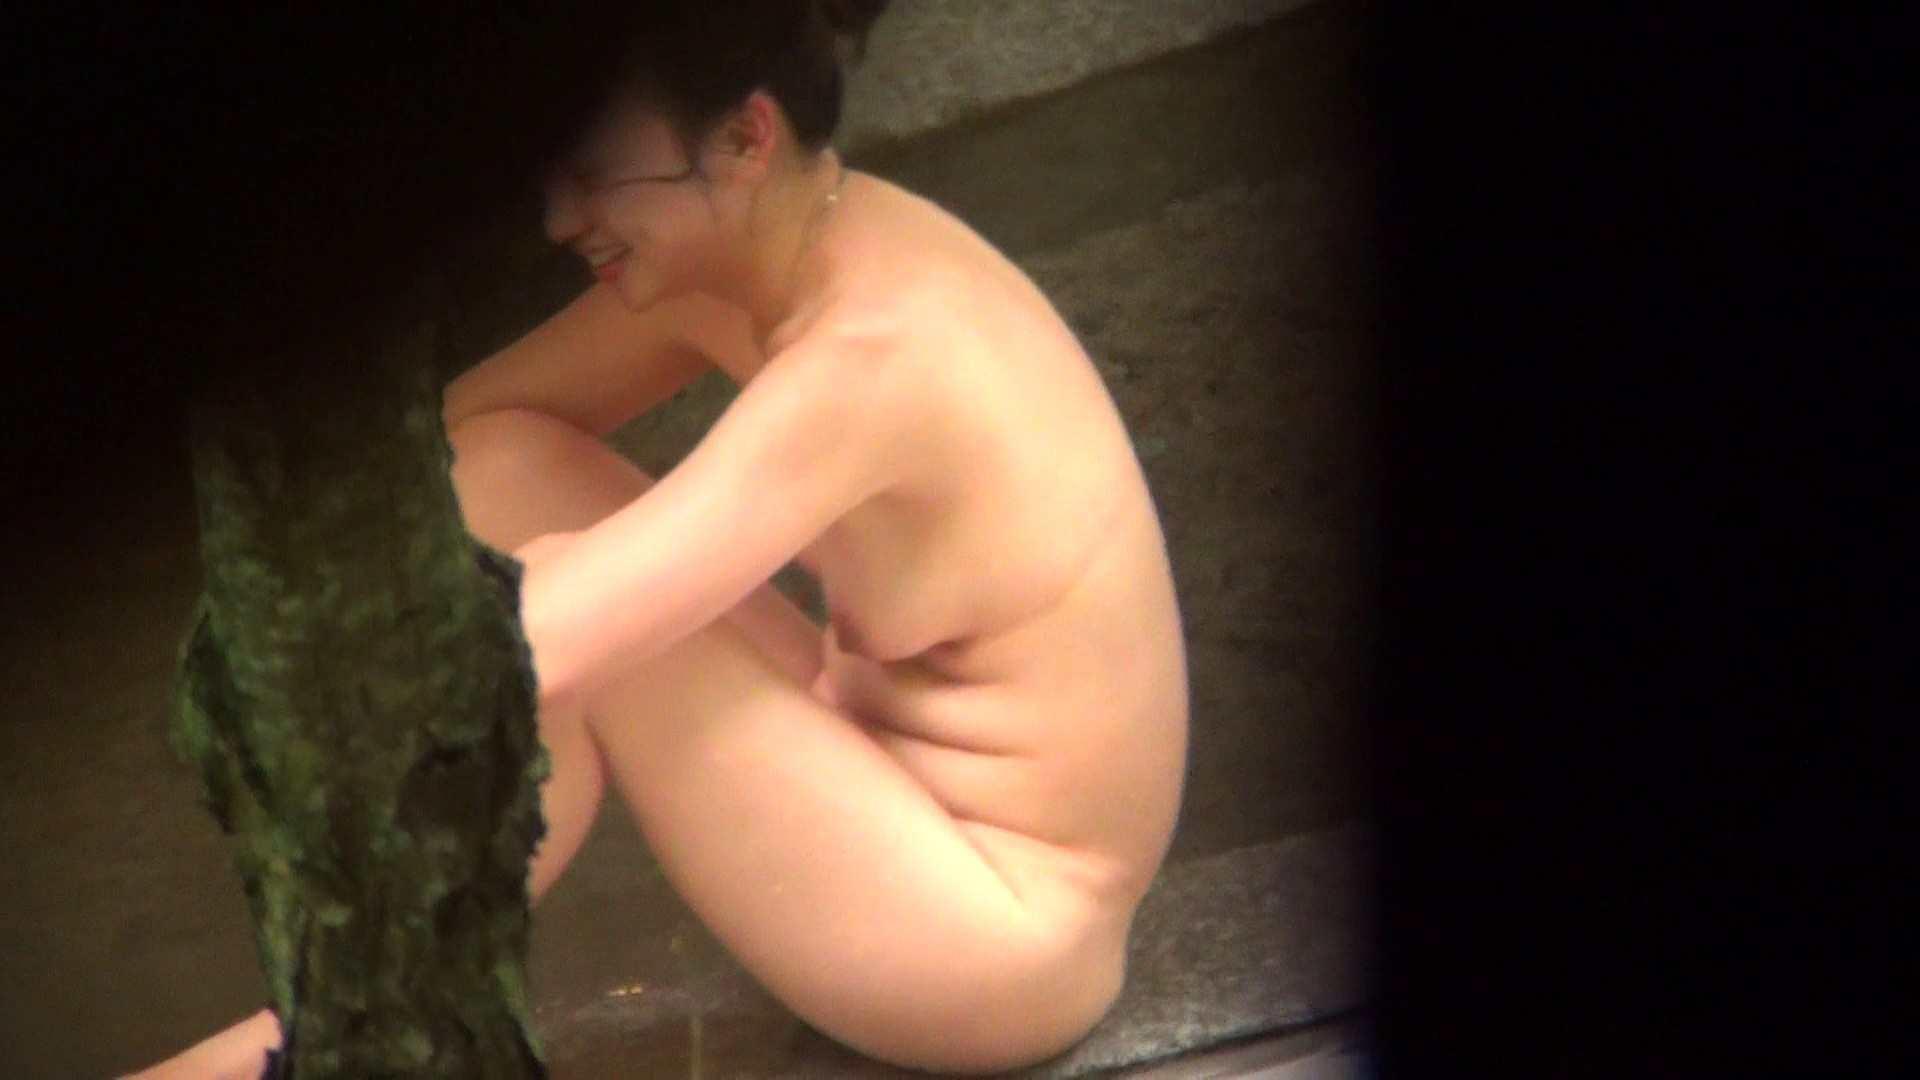 Vol.80 出産経験済みの弛んだ肉体と大胆すぎるアングル 美女 濡れ場動画紹介 79枚 62